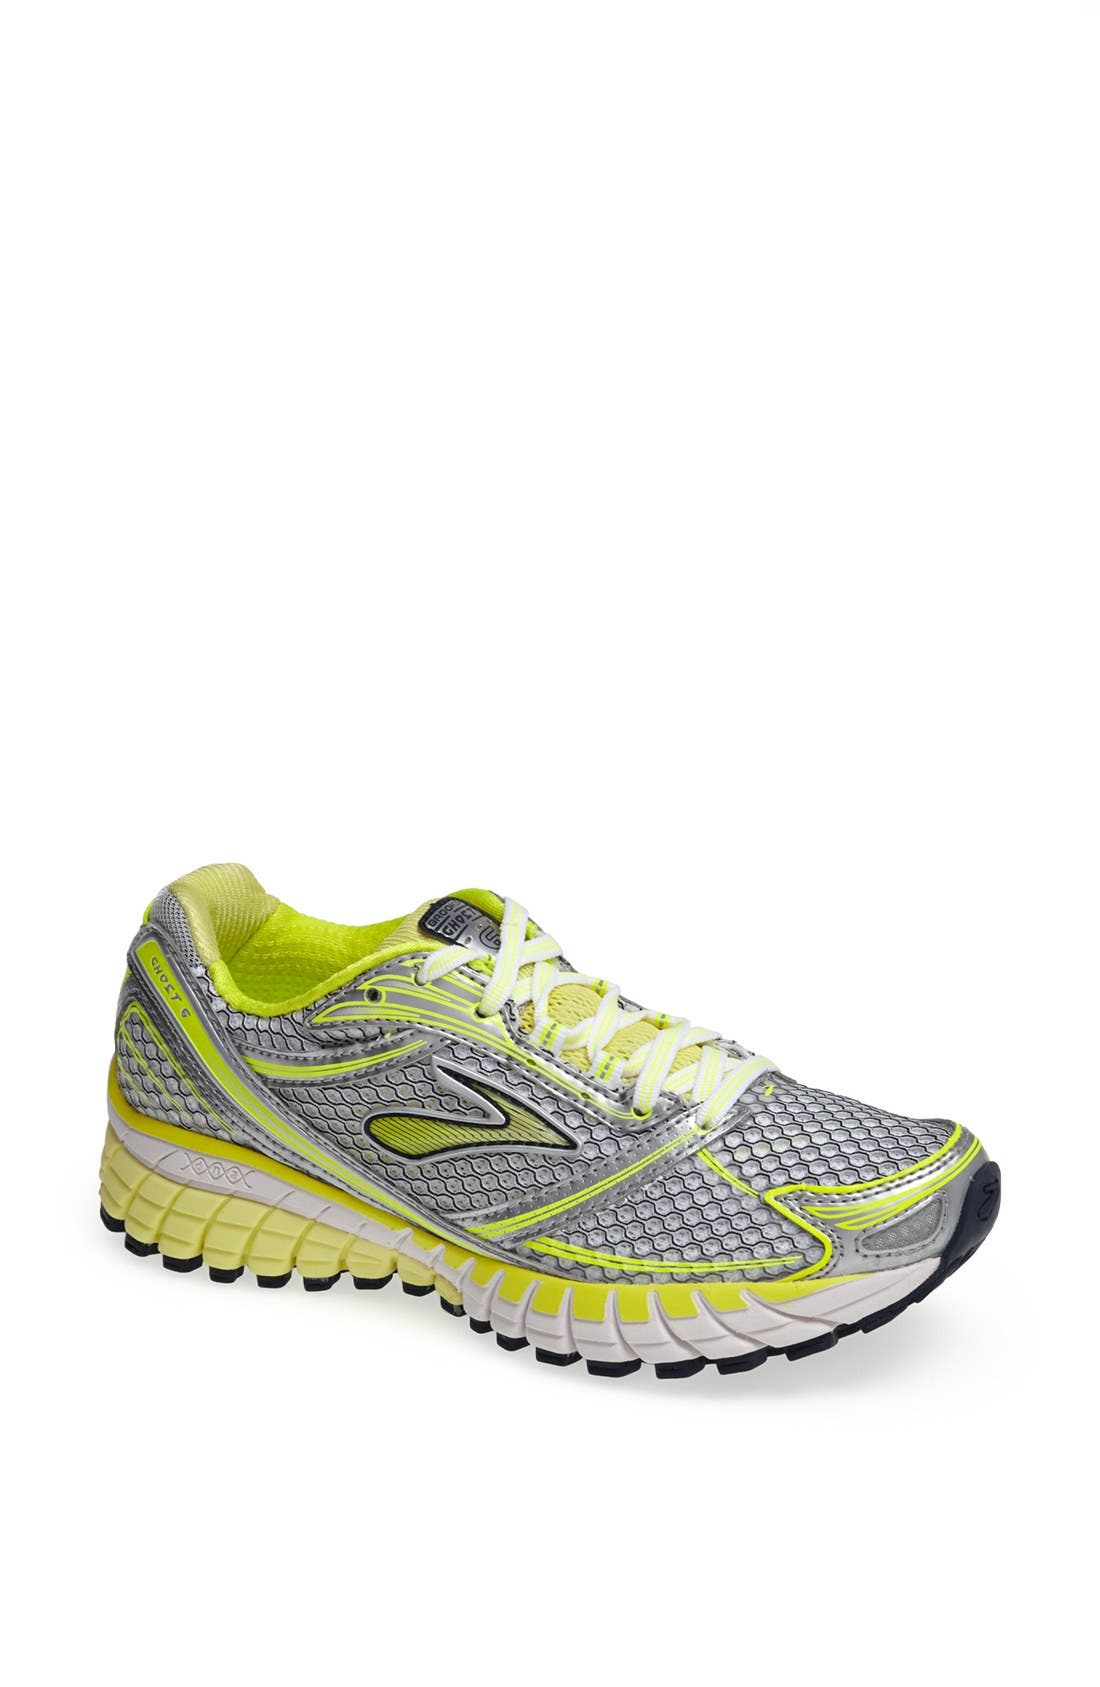 Main Image - Brooks 'Ghost 6' Running Shoe (Women) (Regular Retail Price: $109.95)